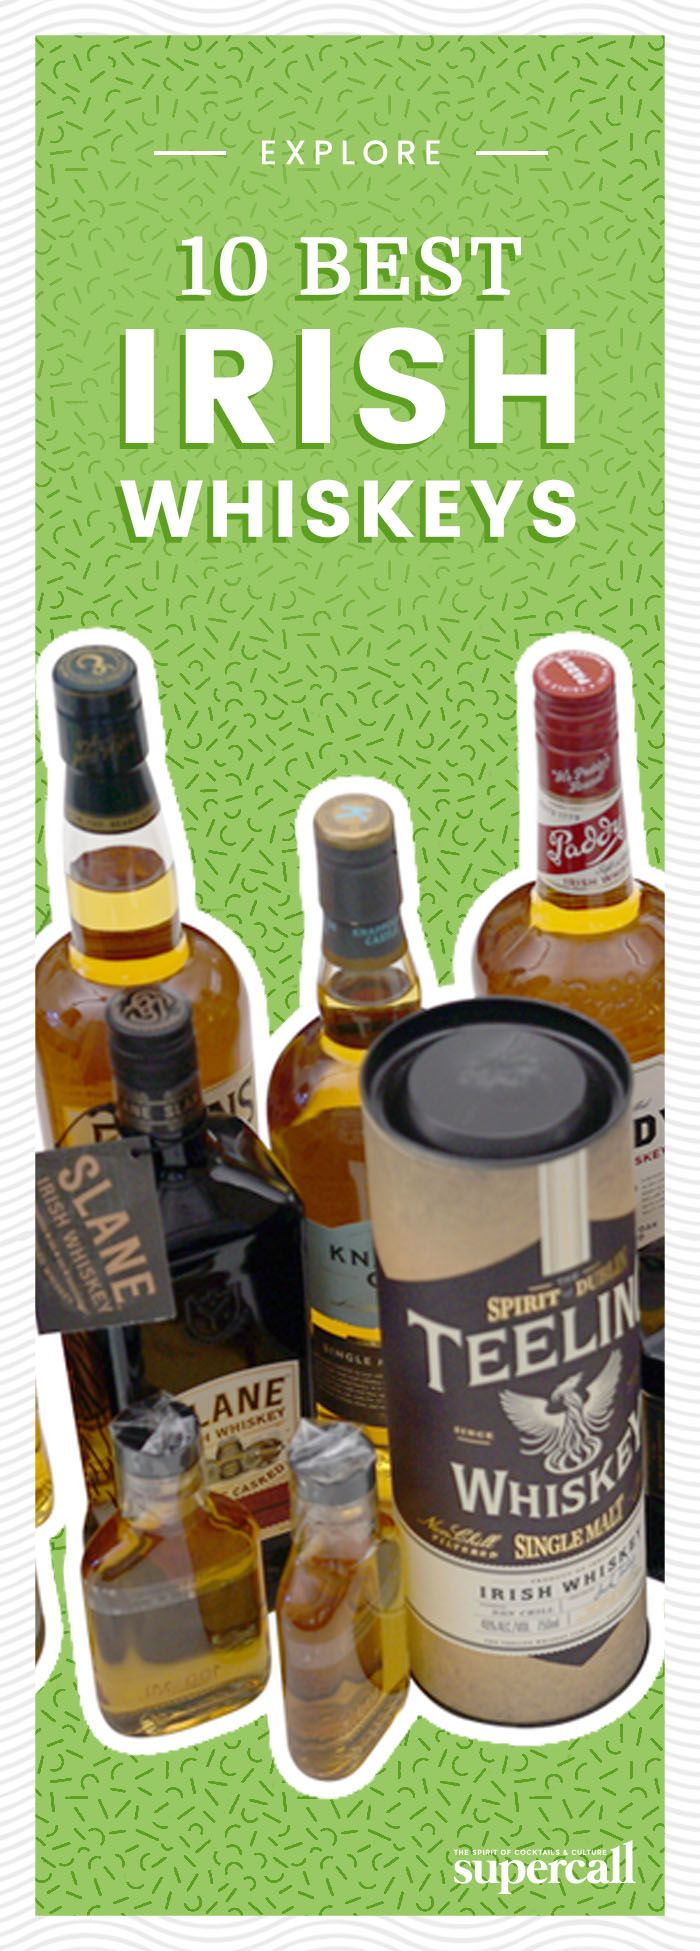 10 Best Irish Whiskeys You Need to Try ASAP